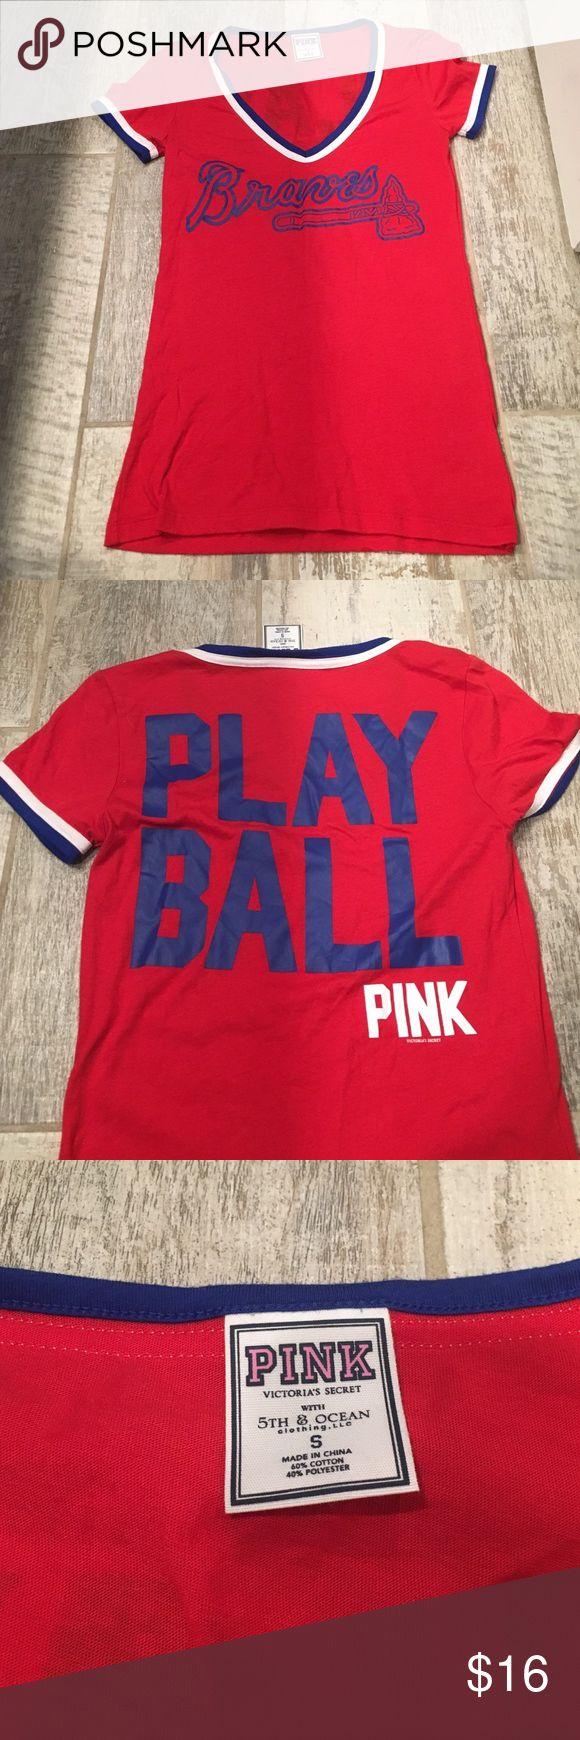 Atlanta Braves PINK brand shirt Cute Atlanta Braves PINK brand shirt.  Size small.  Only worn once to a game.  Great condition. PINK Victoria's Secret Tops Tees - Short Sleeve